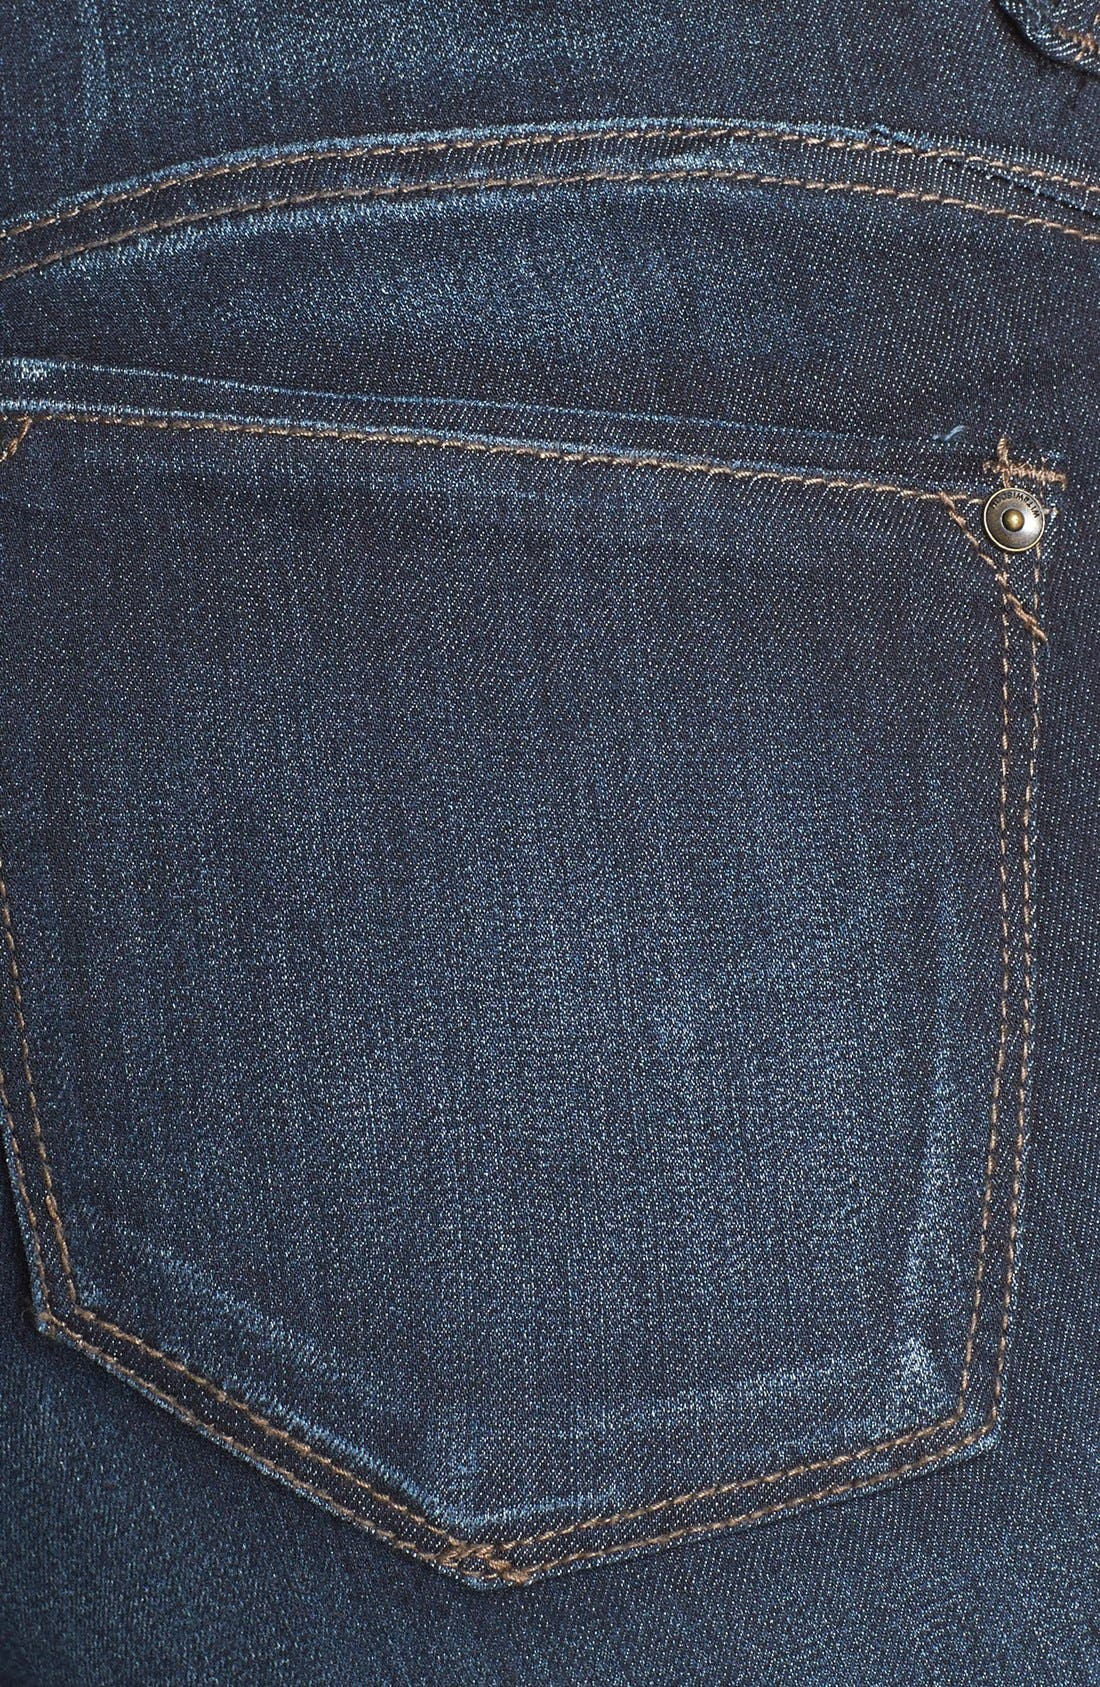 WIT & WISDOM, 'Super Smooth' Stretch Skinny Jeans, Alternate thumbnail 4, color, DARK NAVY